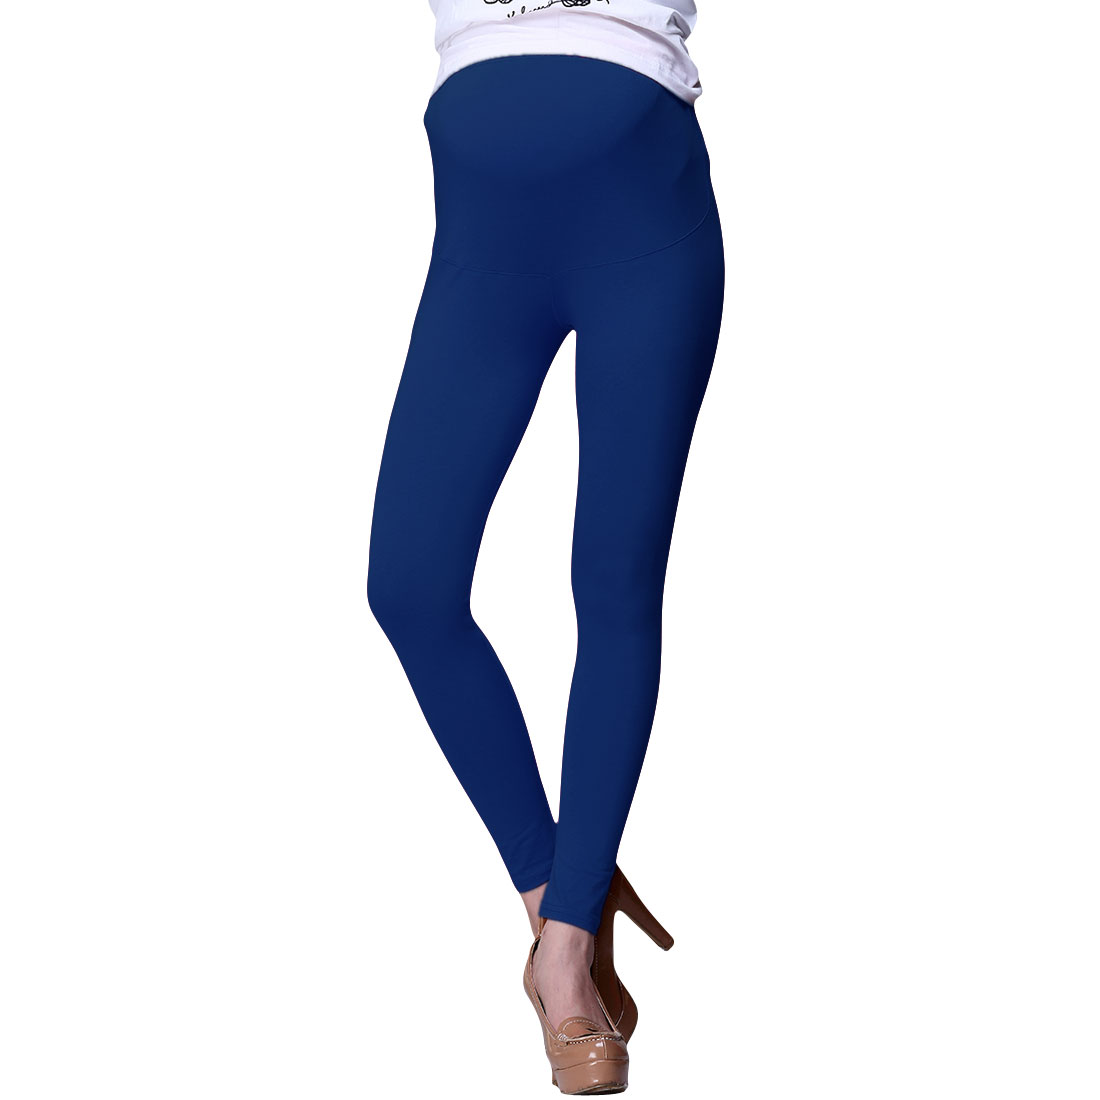 Motherhood Elastic Waistband Slim Fit Stretch Blue Leggings XS